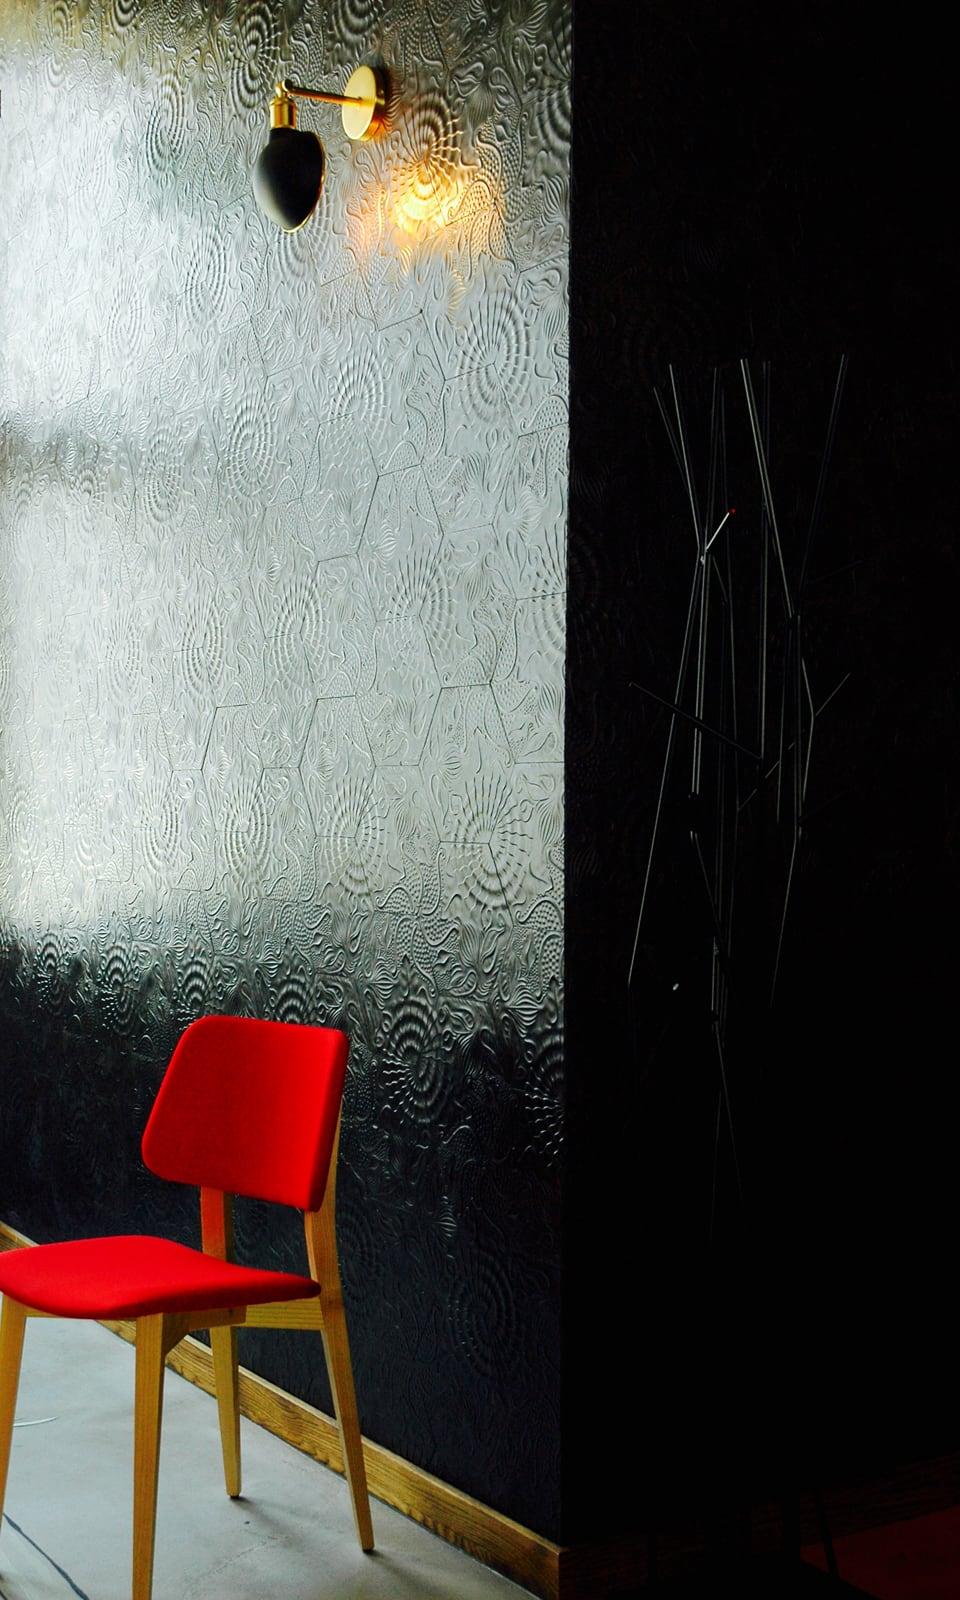 zementfliesen-terrazzofliesen-kreidefarbe-terrazzo-fugenlos-viaplatten-60G-greybar-01 | N° 60G